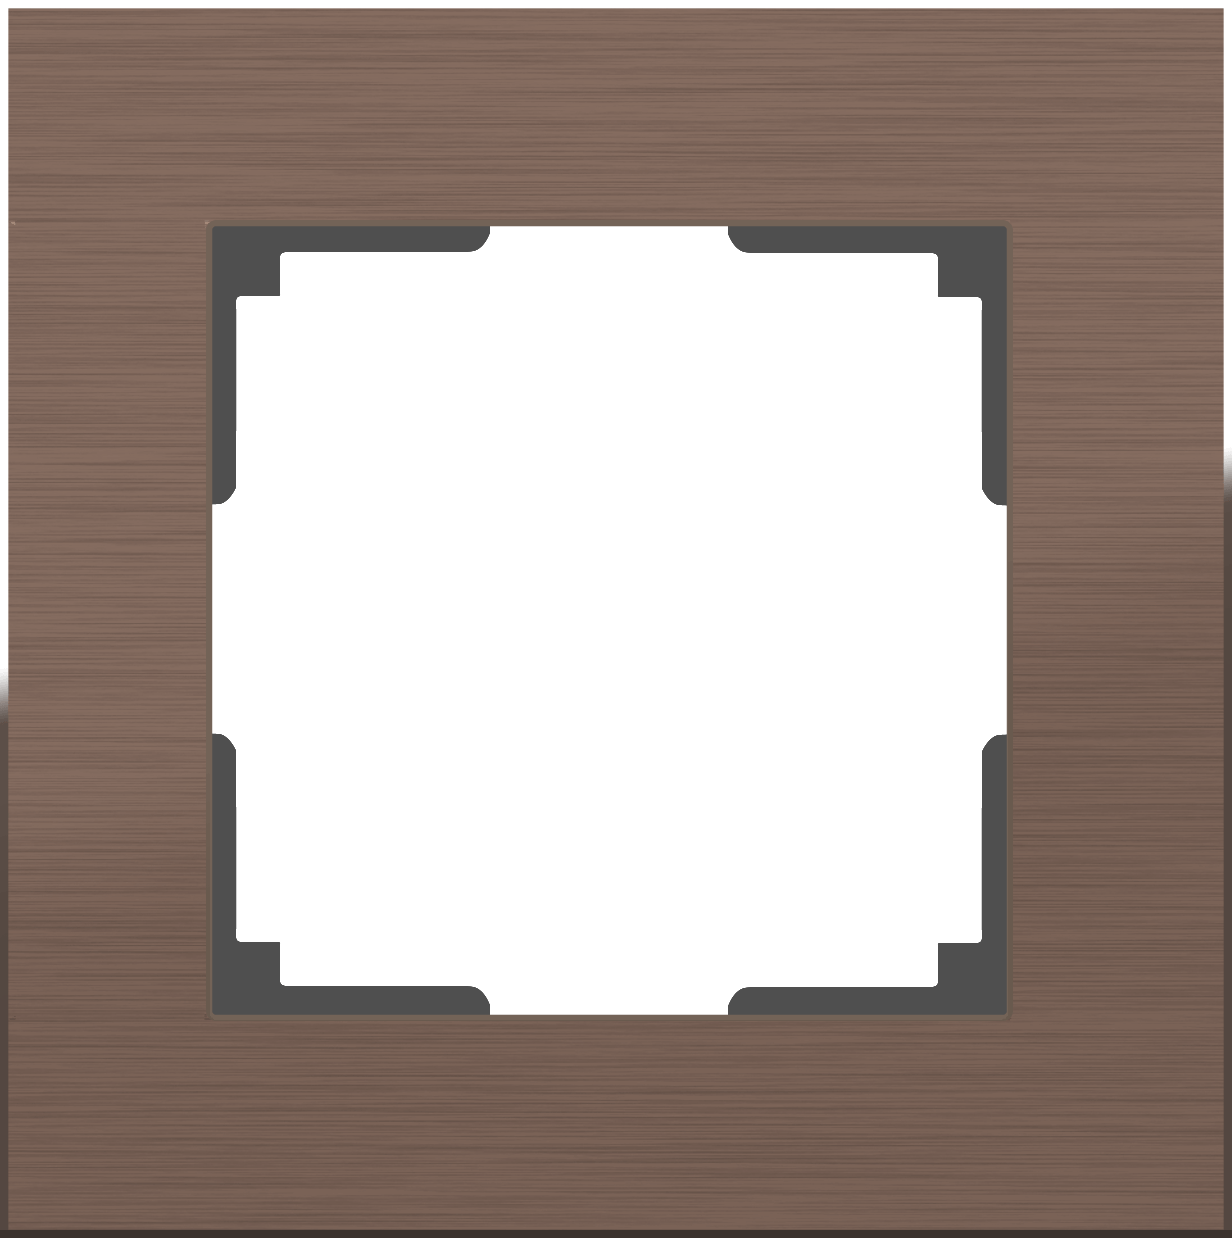 Рамка Aluminium на 1 пост алюминий коричневый WL11-Frame-01 4690389073687 цена и фото